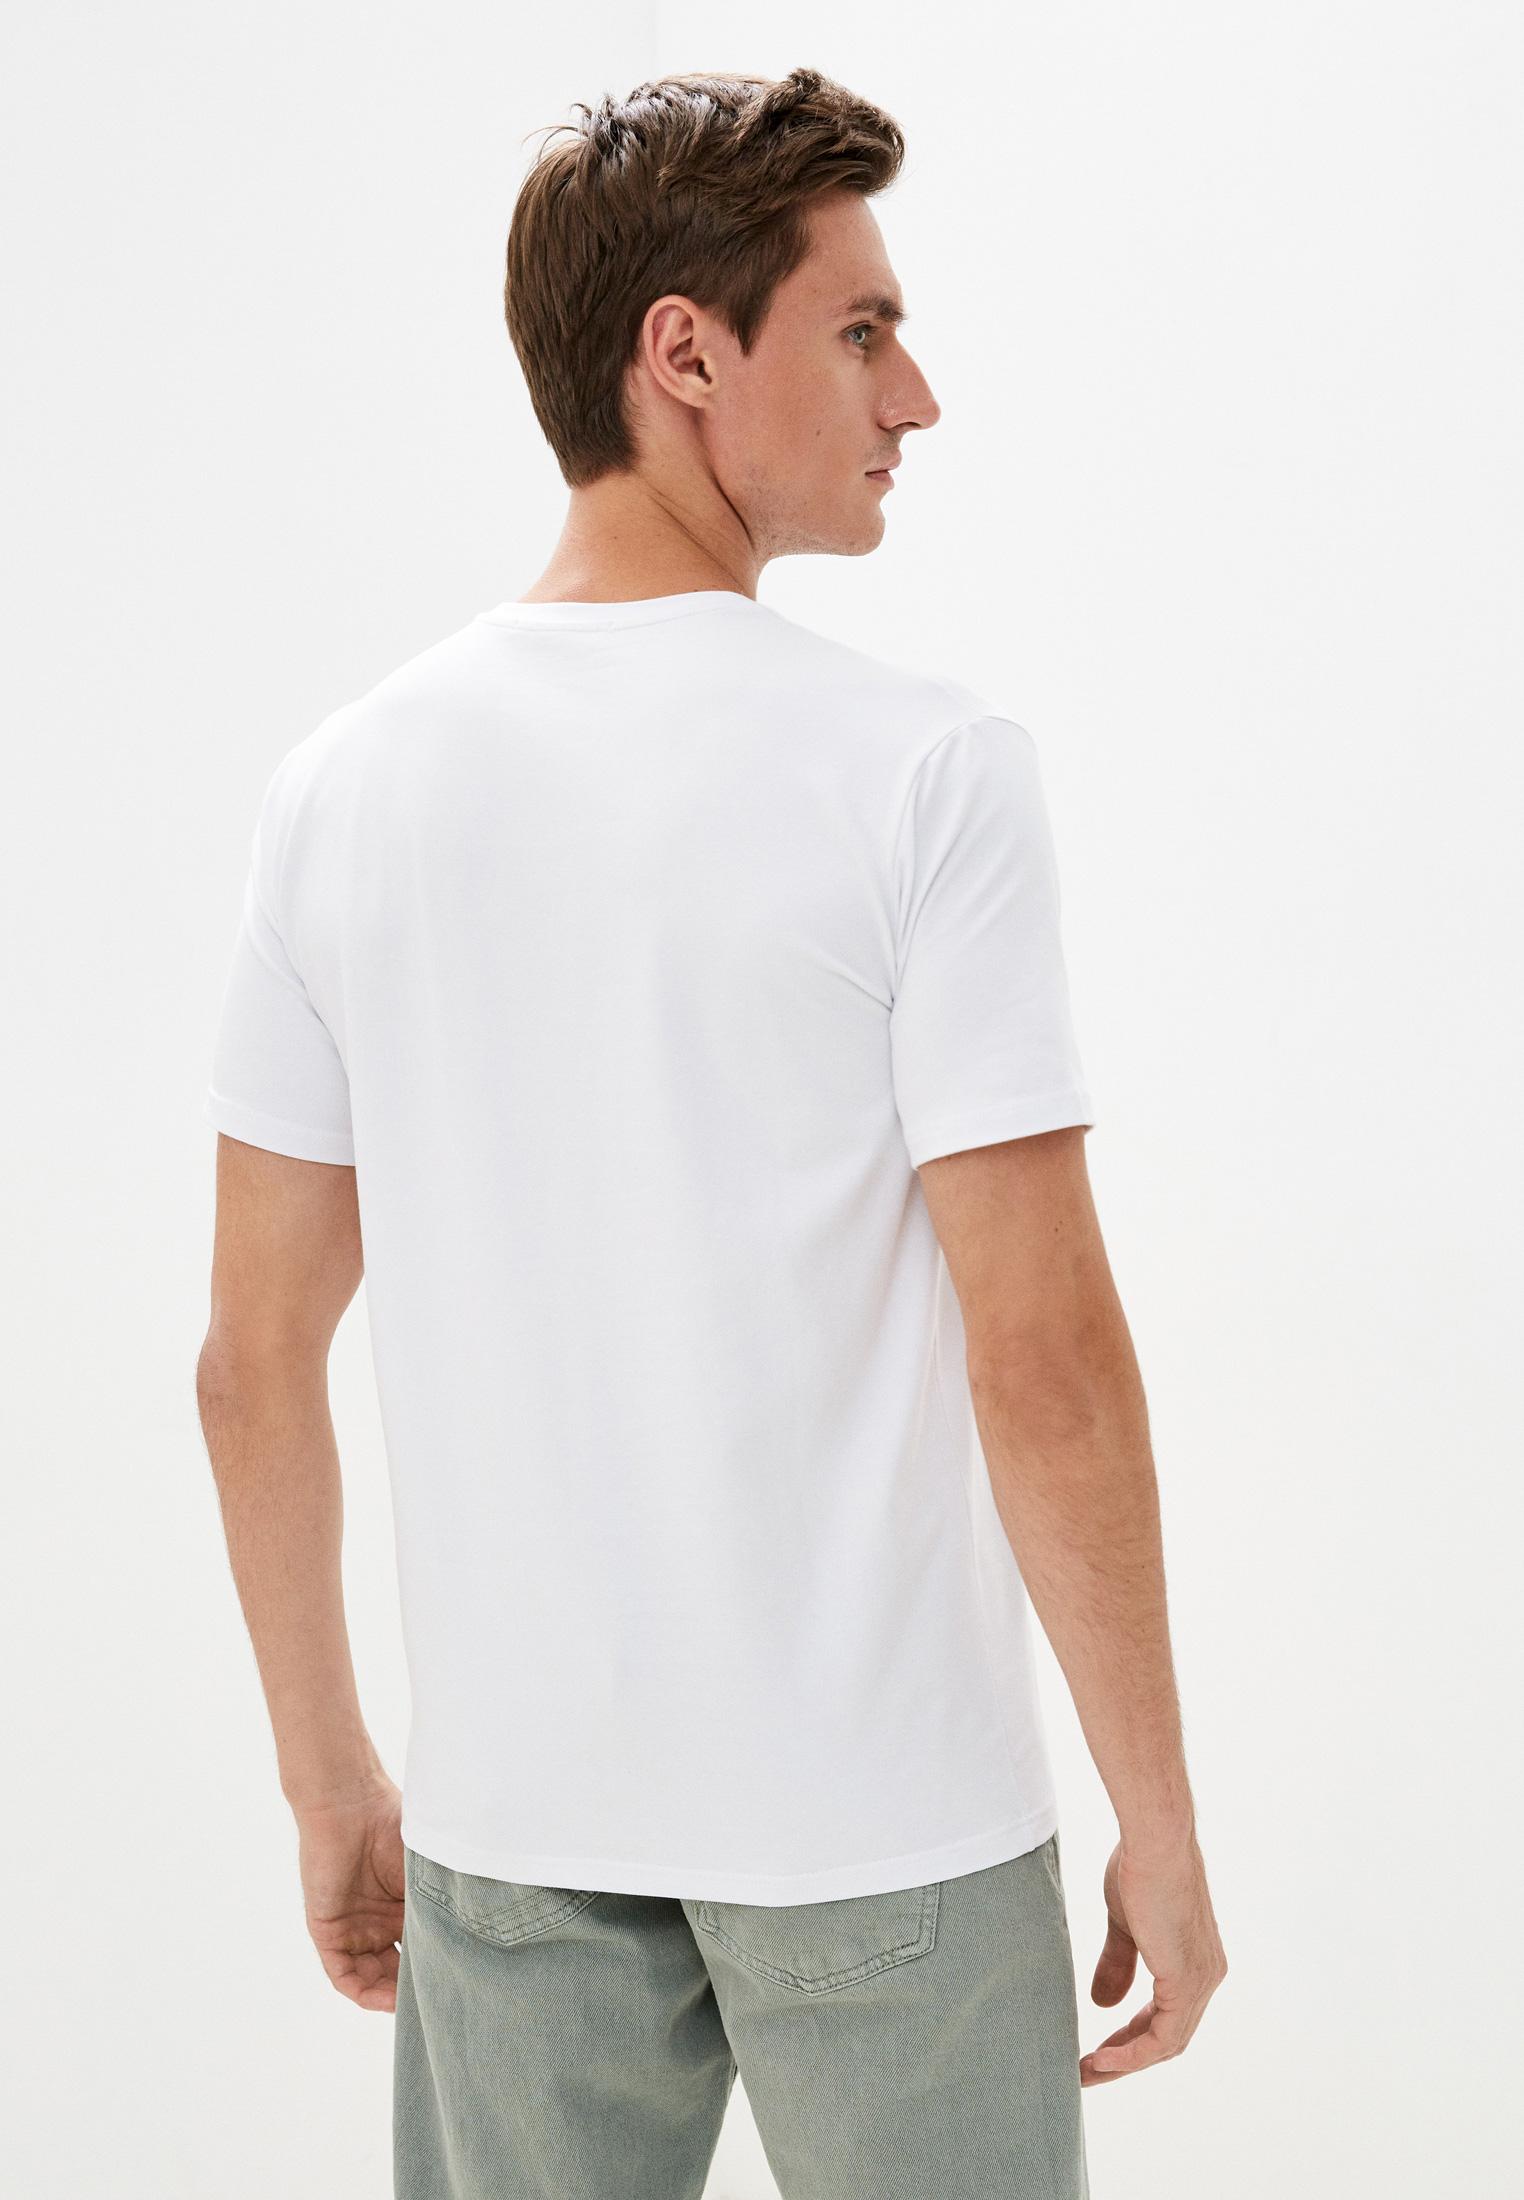 Мужская футболка Baldinini (Балдинини) TSU03: изображение 4